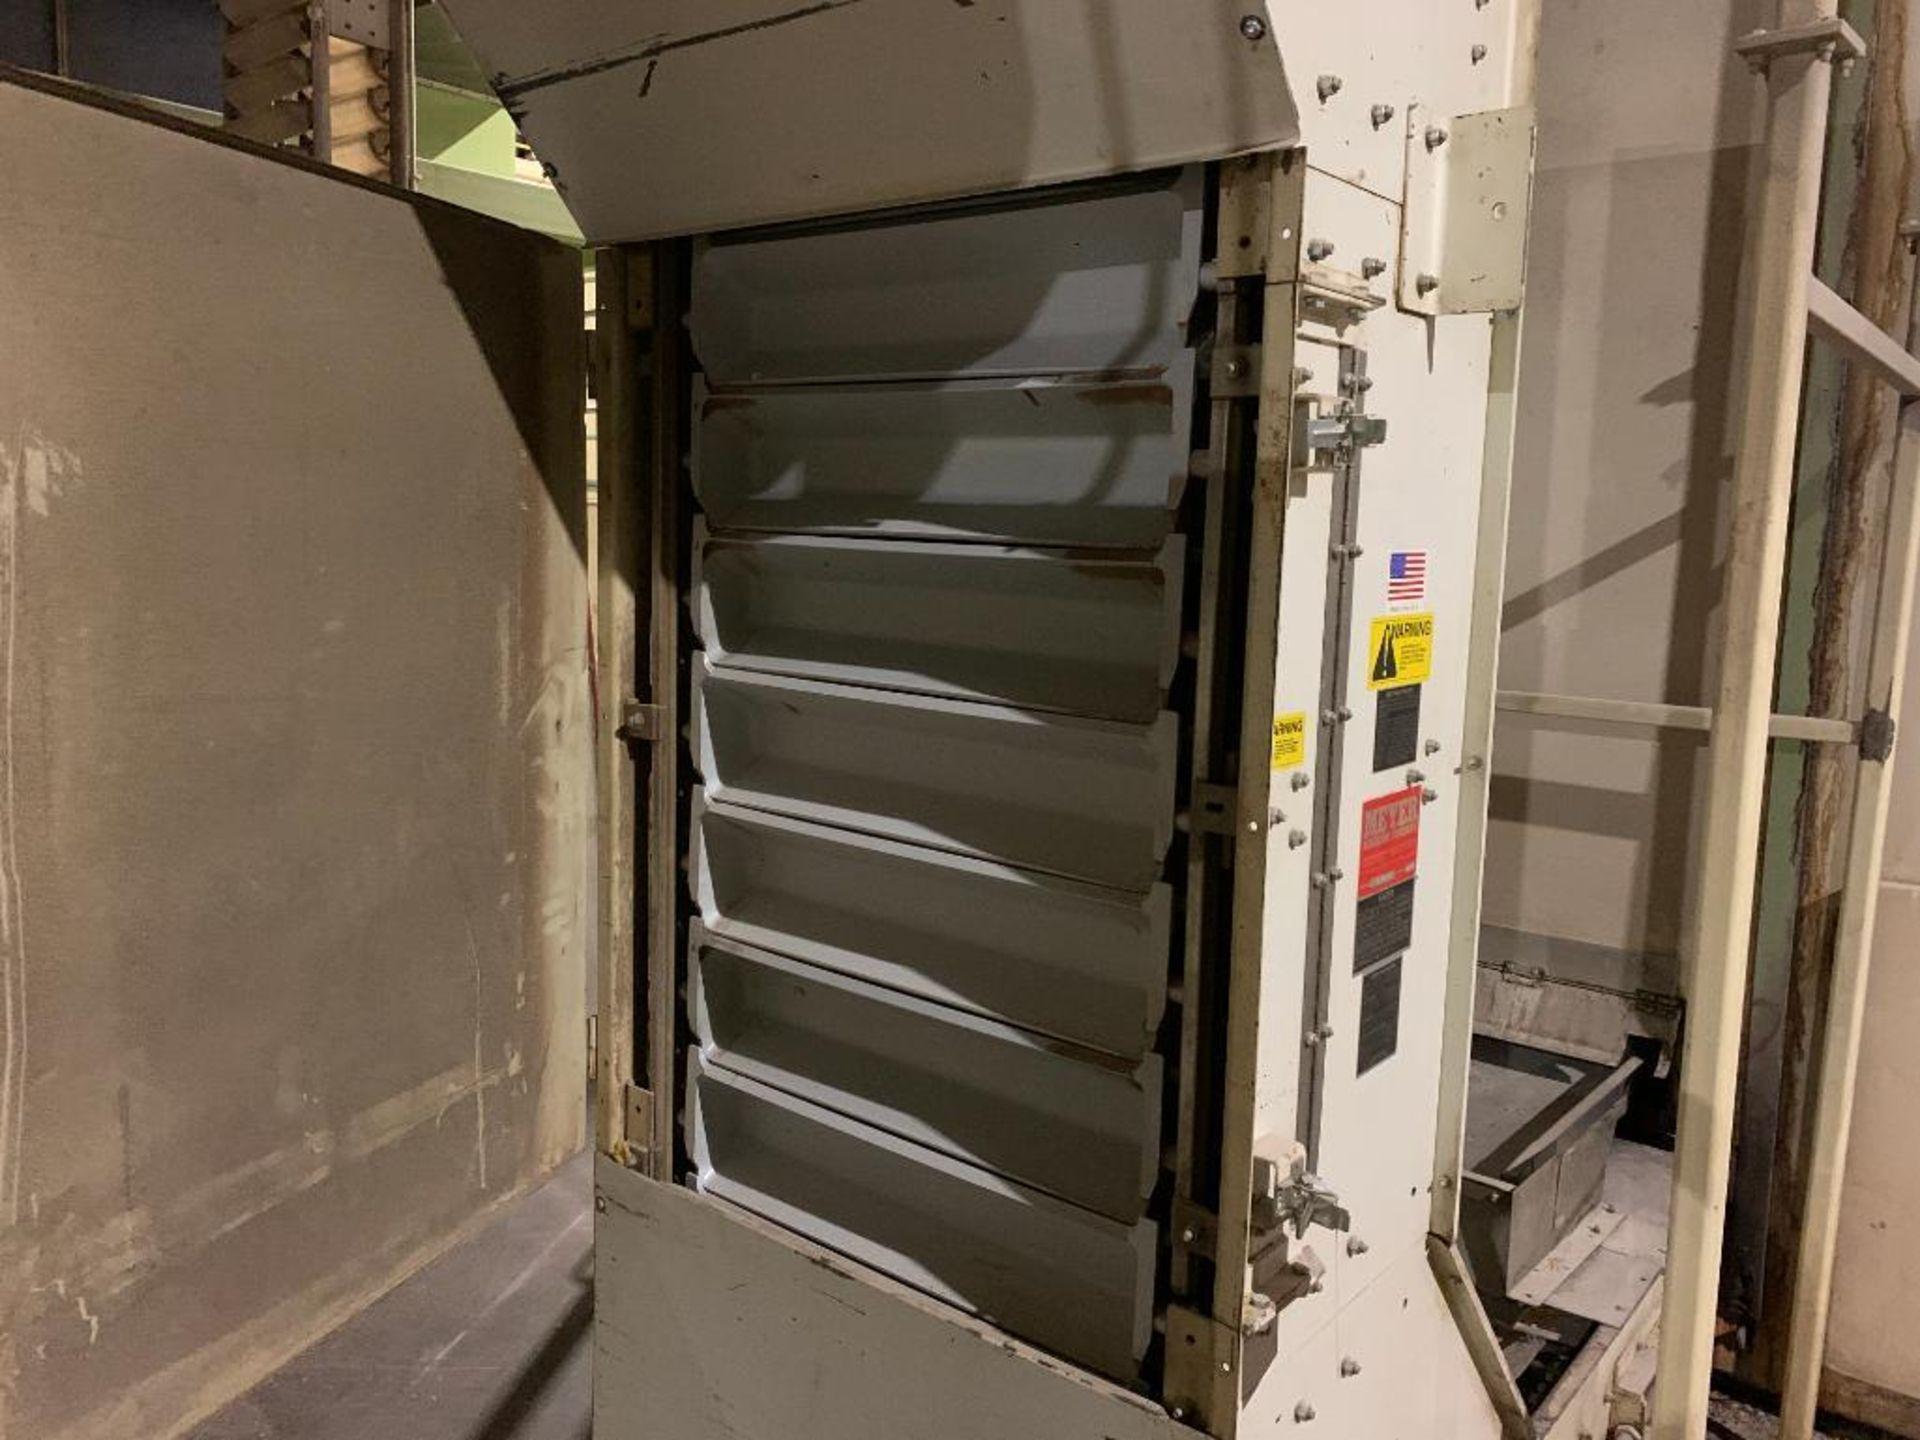 Meyer overlapping bucket elevator, model PA462-24-S - Image 14 of 17